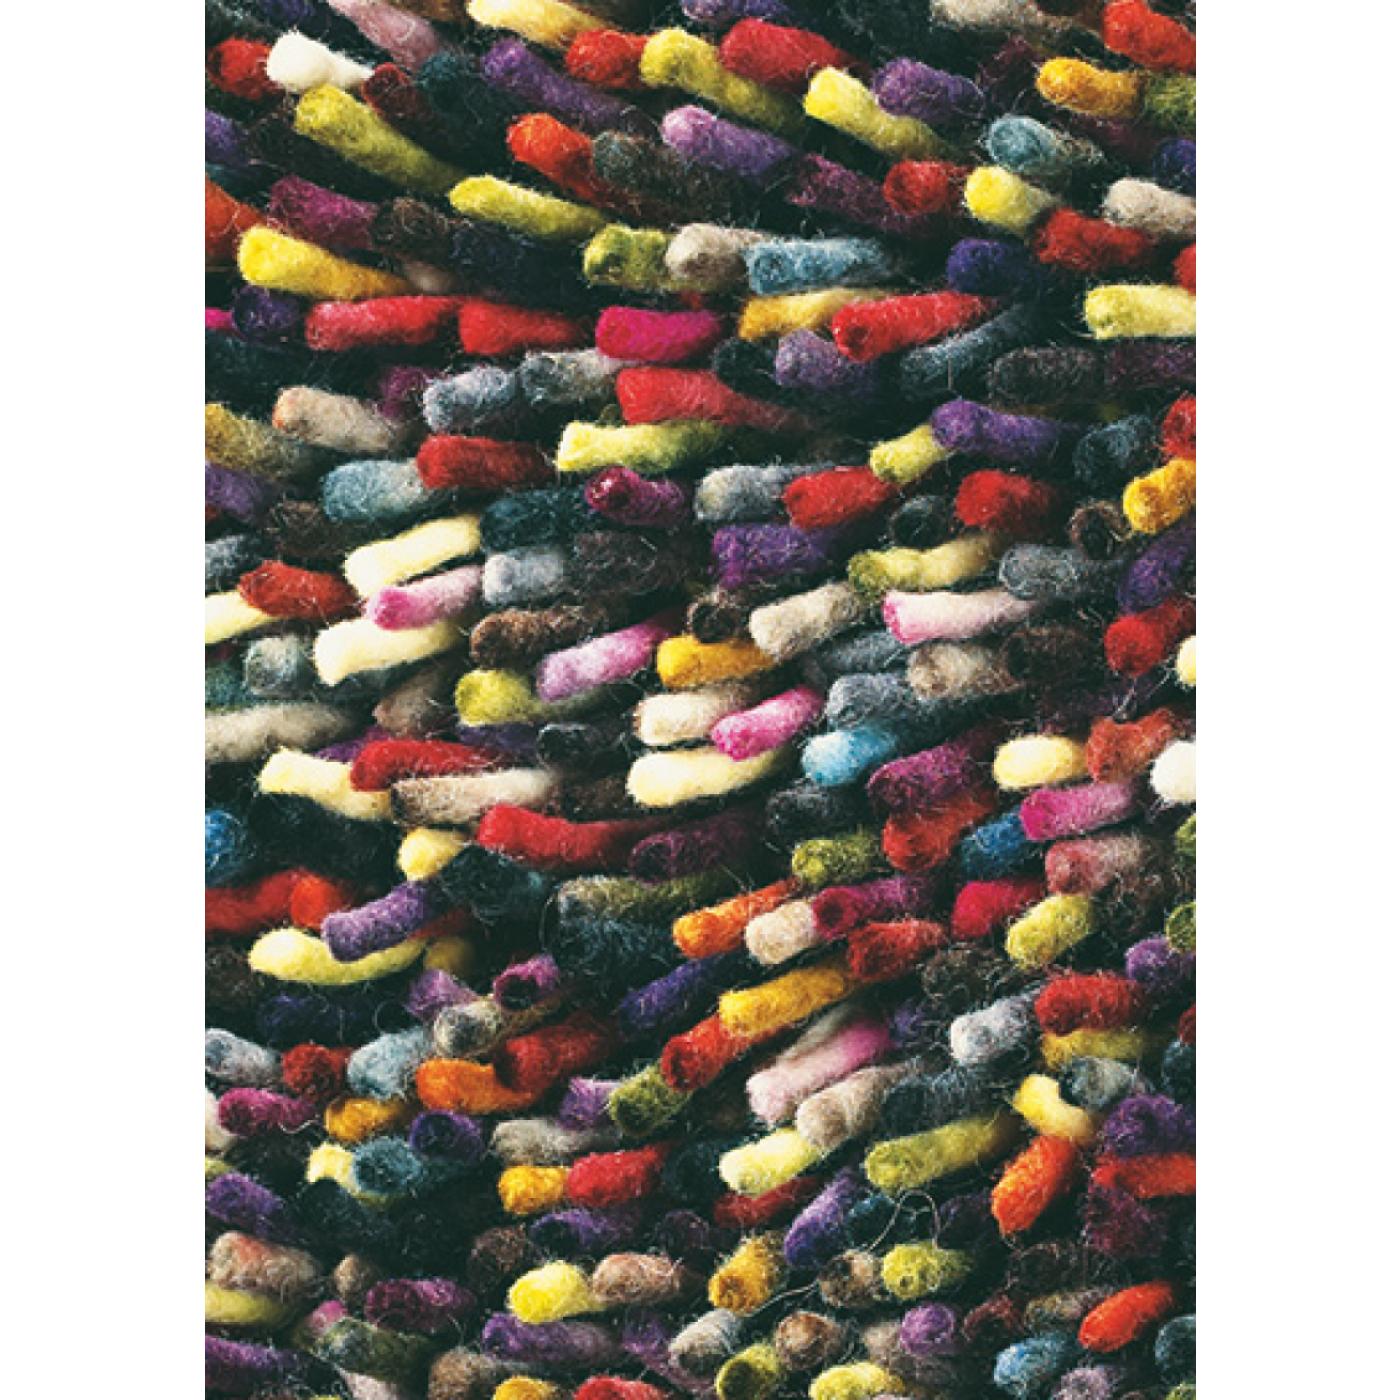 Vloerkleed Rocks Mix 70415